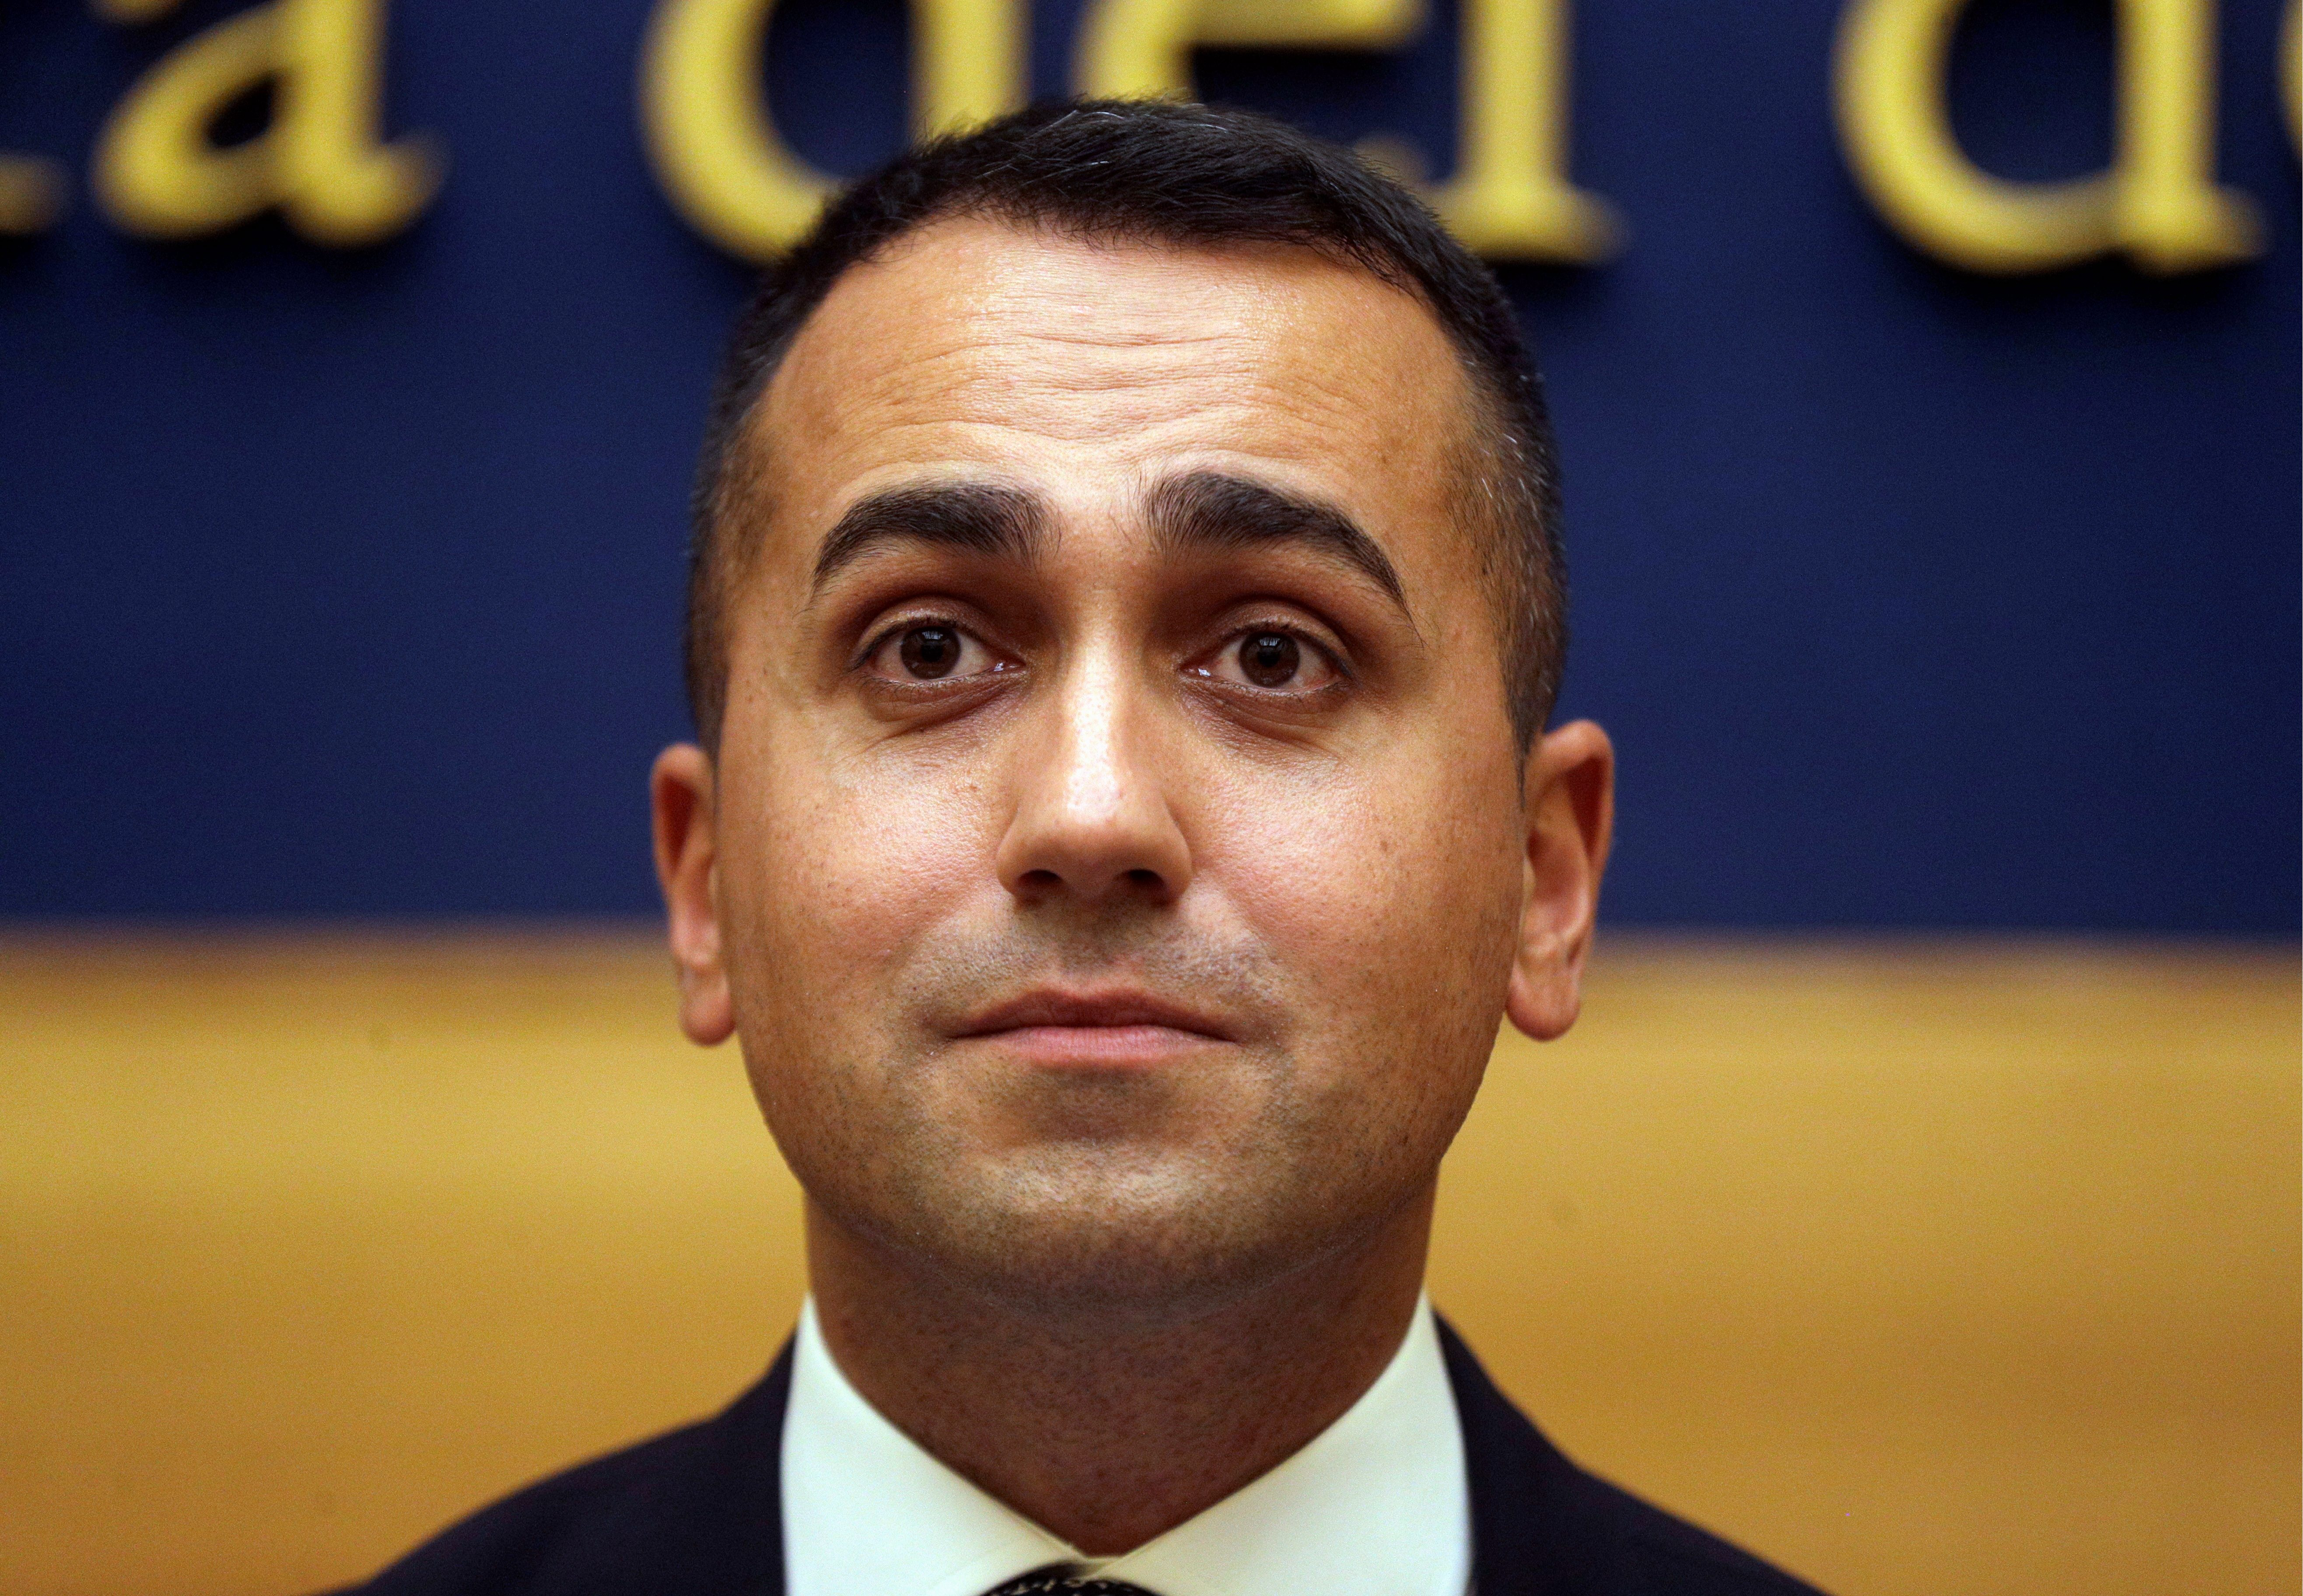 Luigi Di Maio shatters mold as Italy's top diplomat